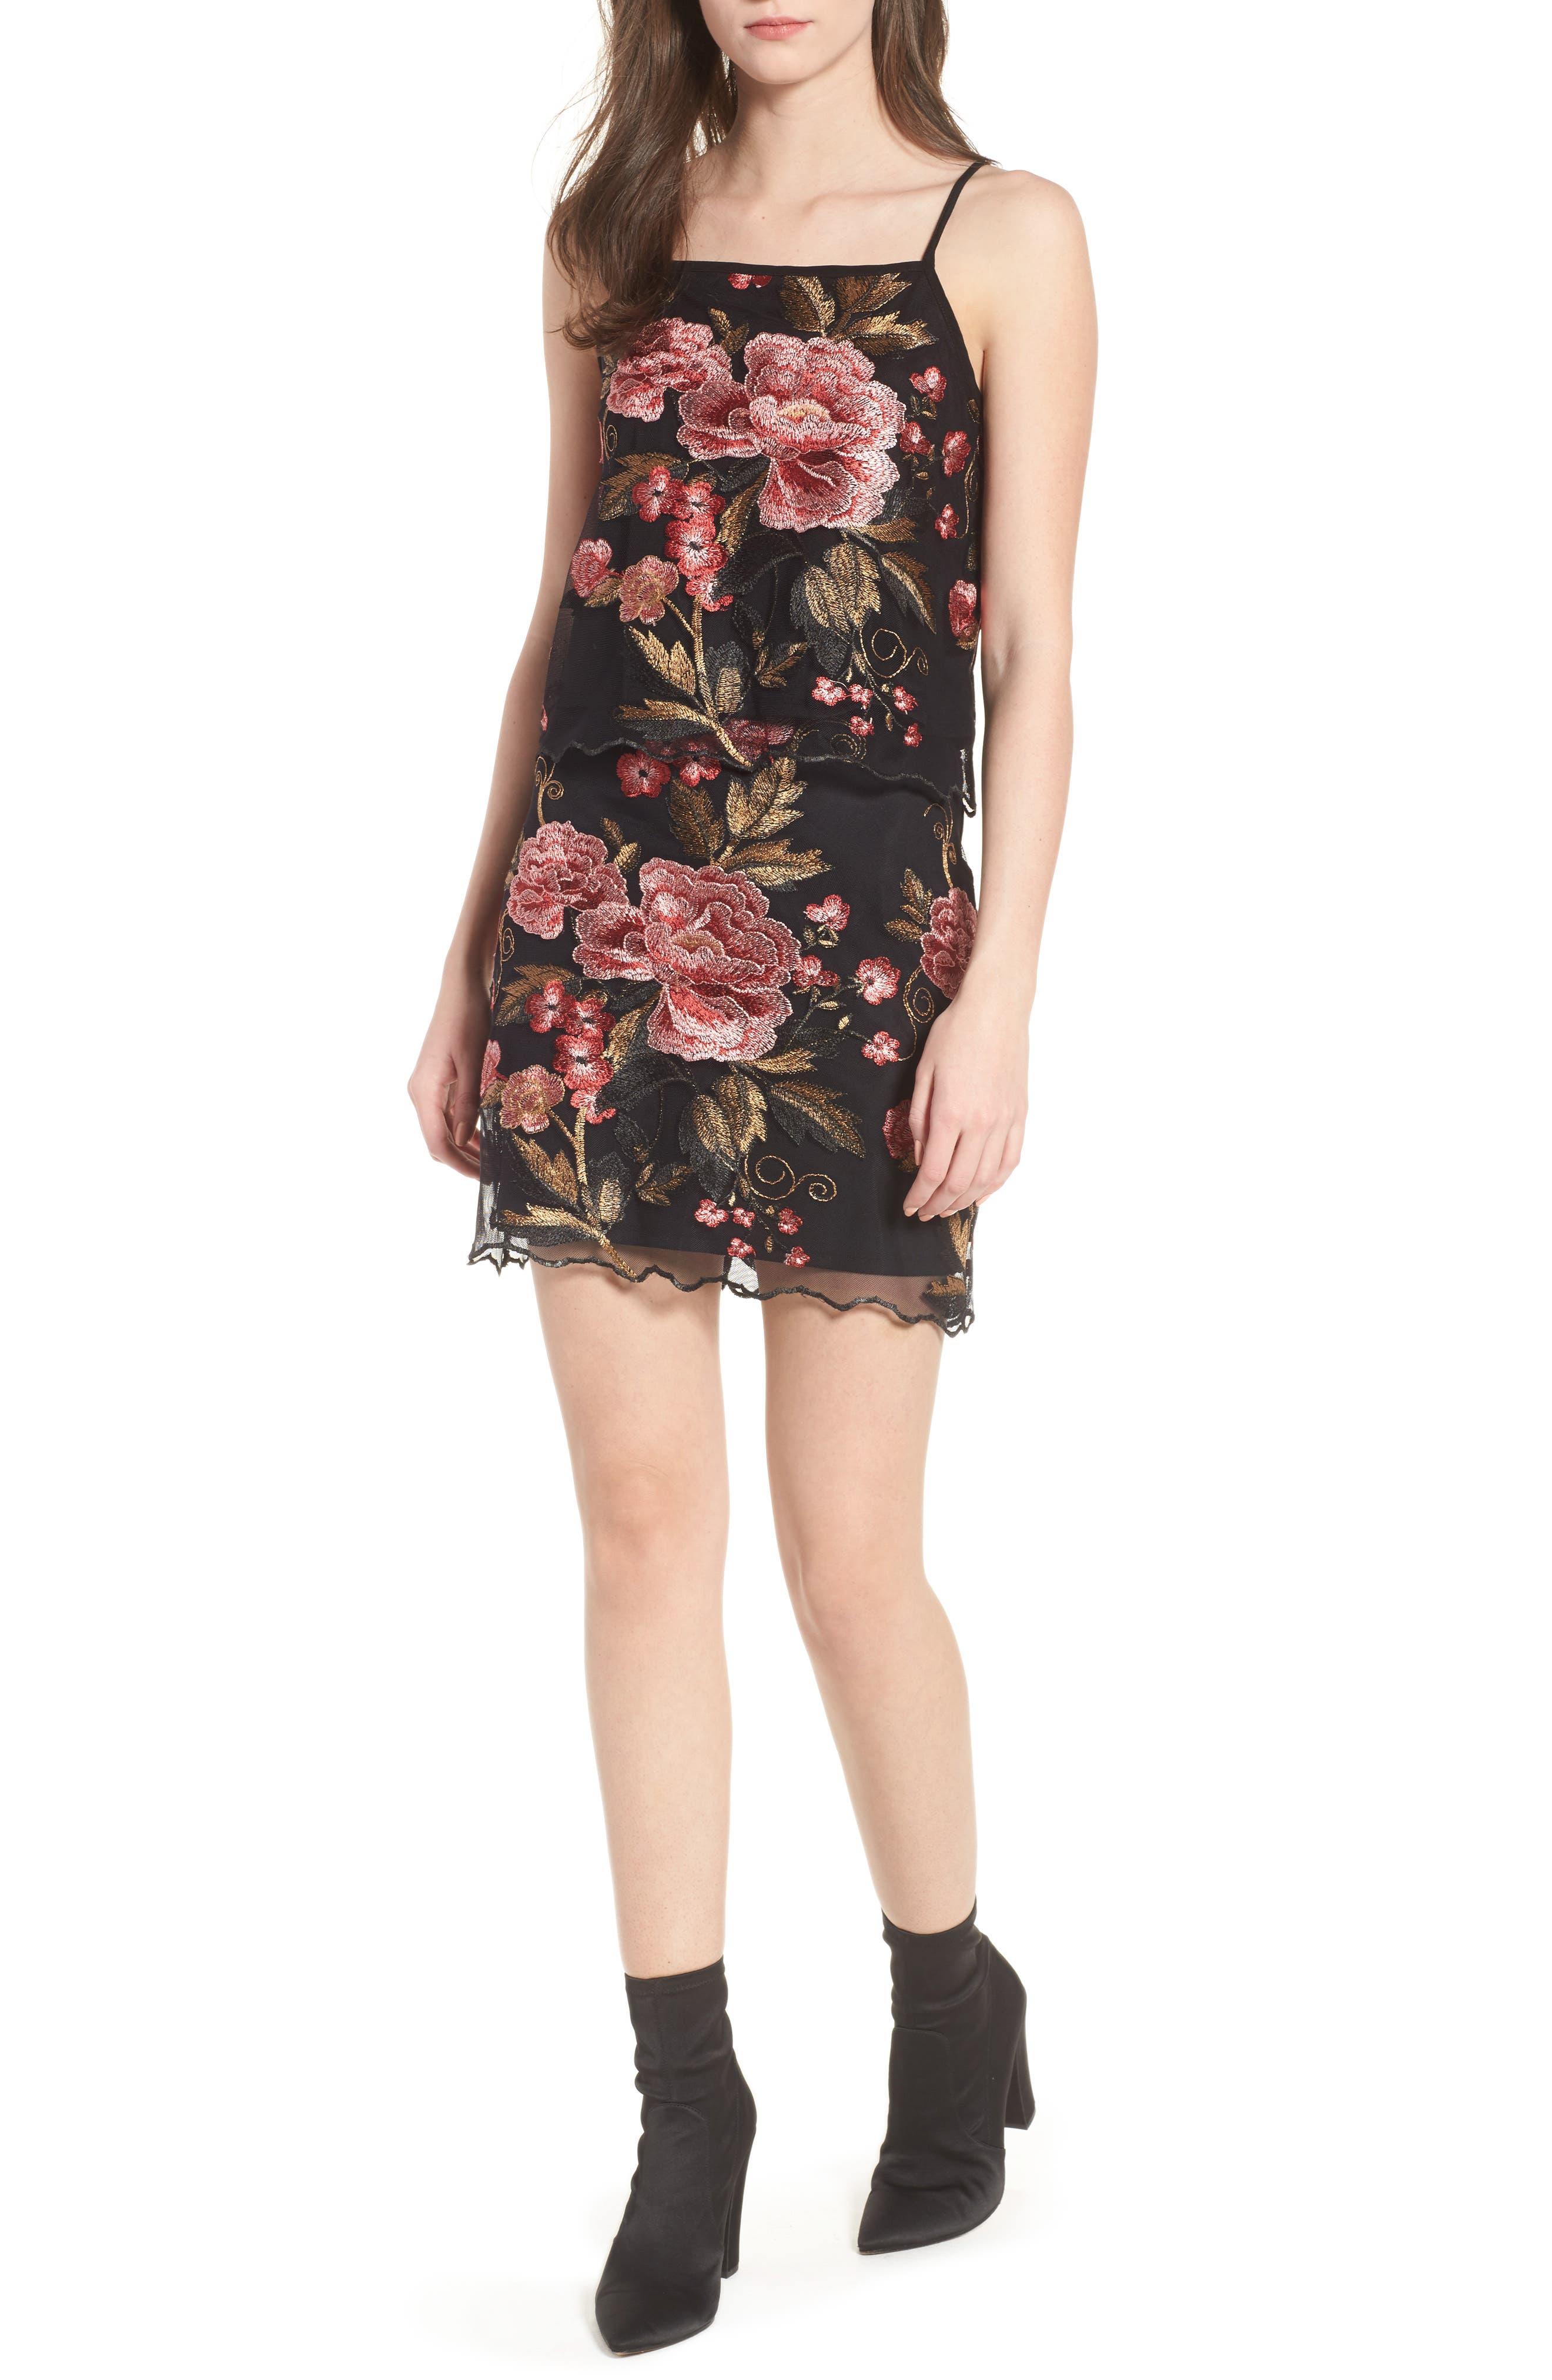 Sunset Embroidered Skirt,                             Alternate thumbnail 7, color,                             008